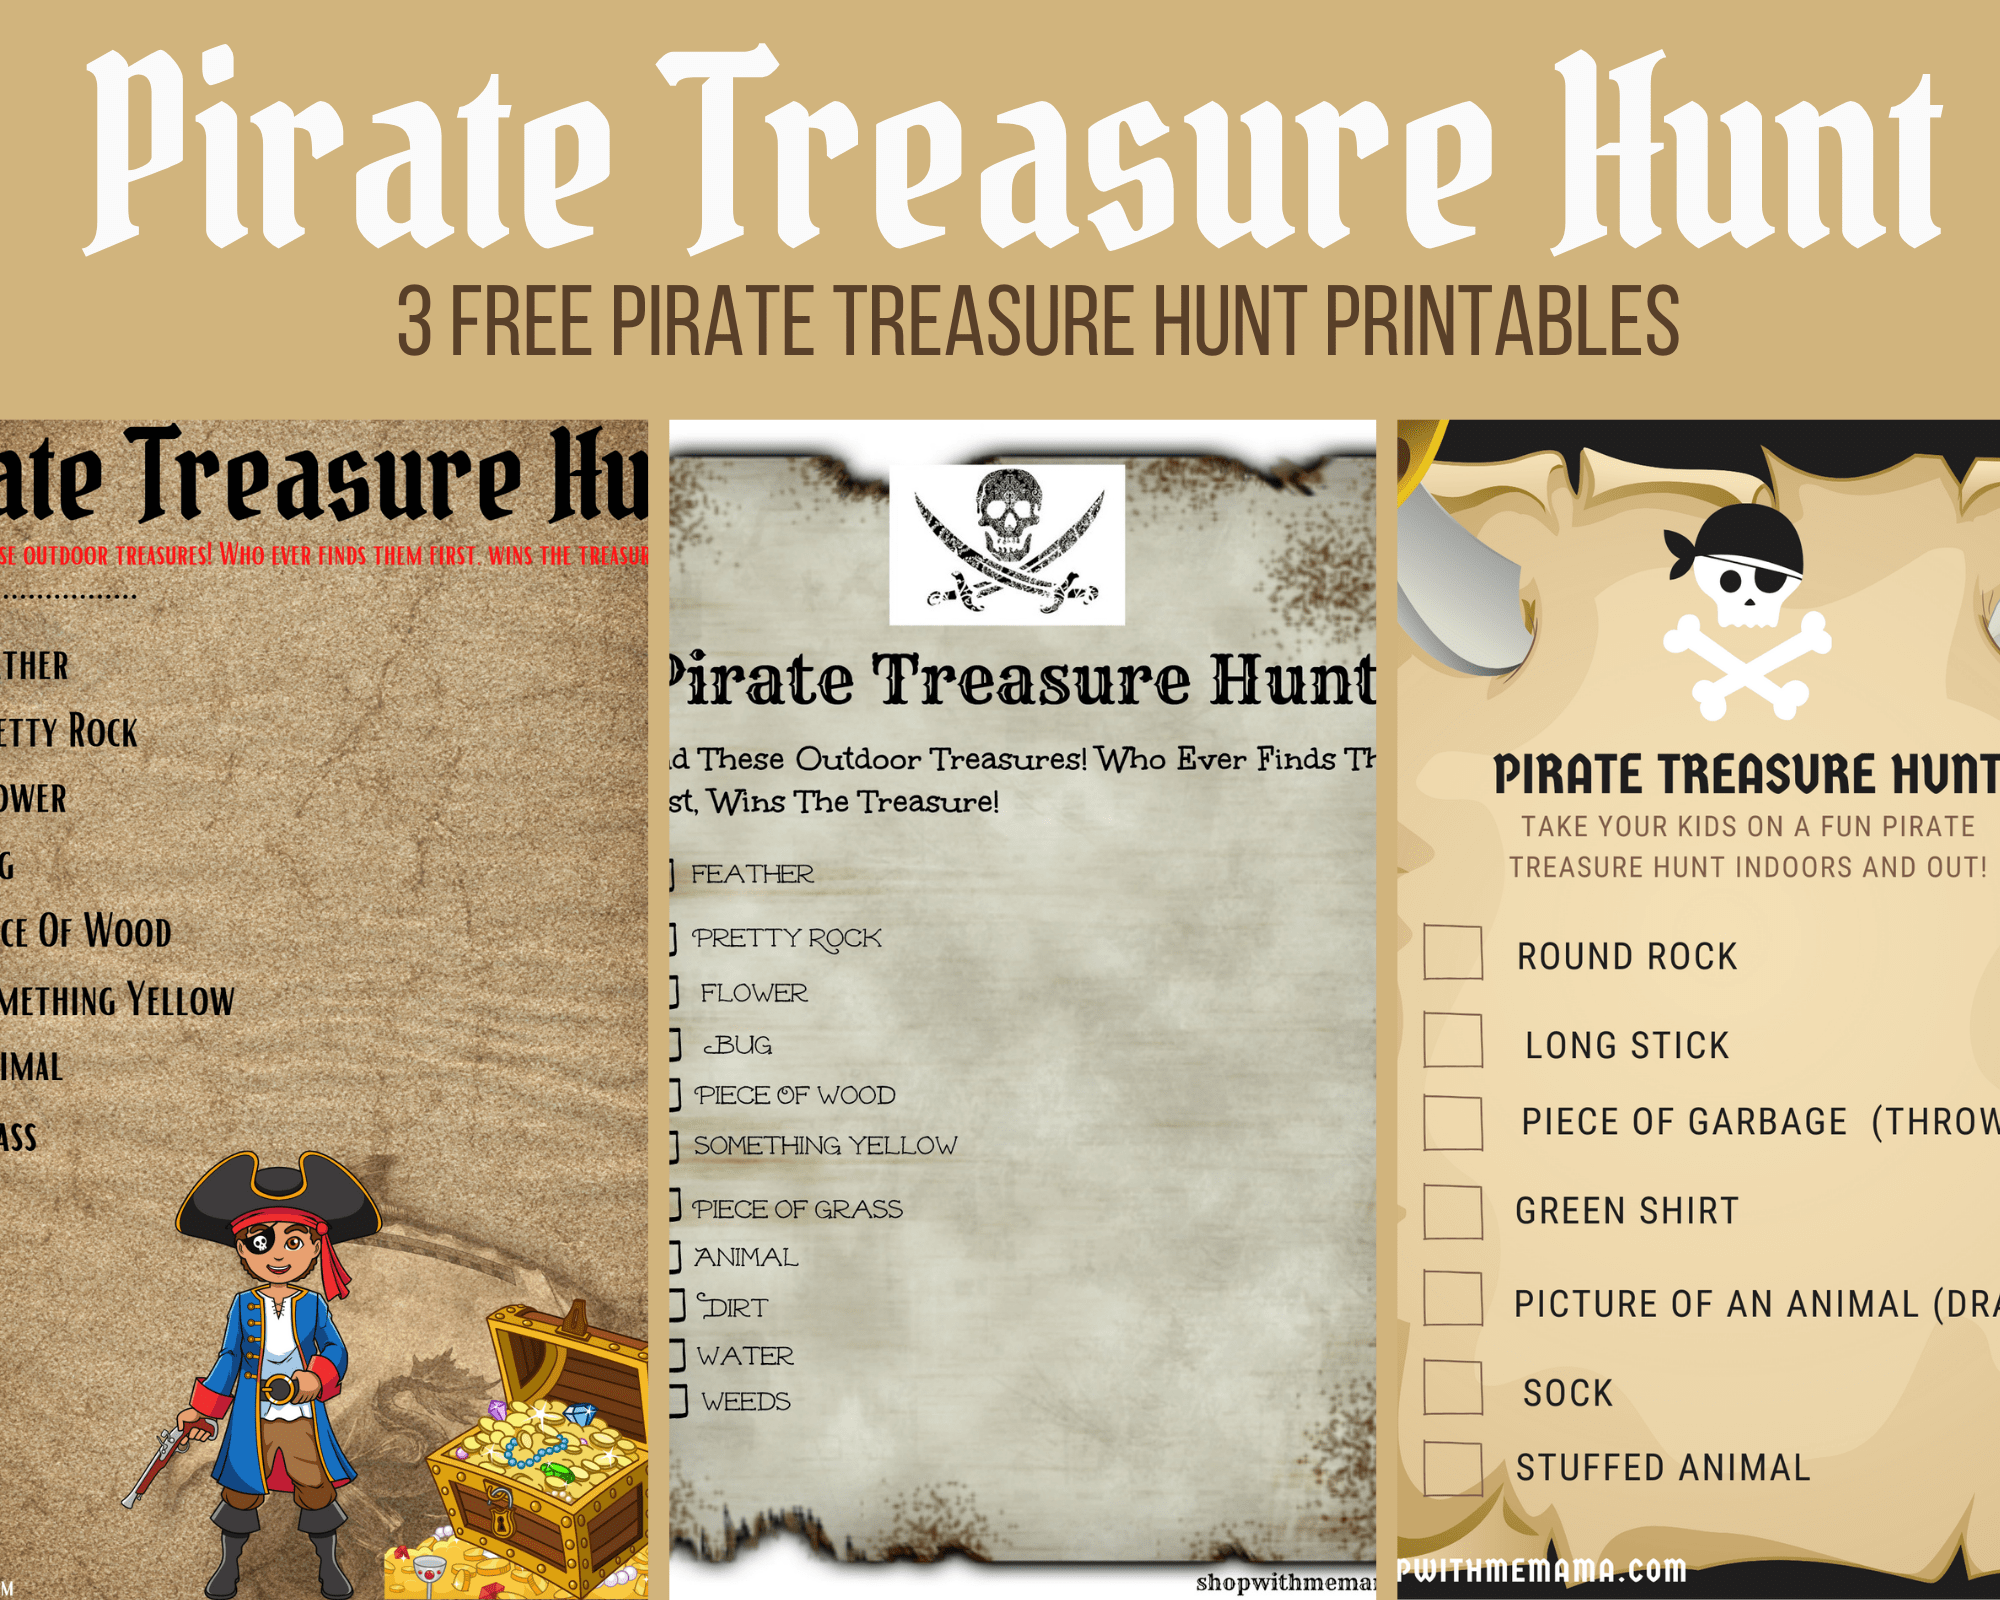 Pirate Treasure Hunt For Kids